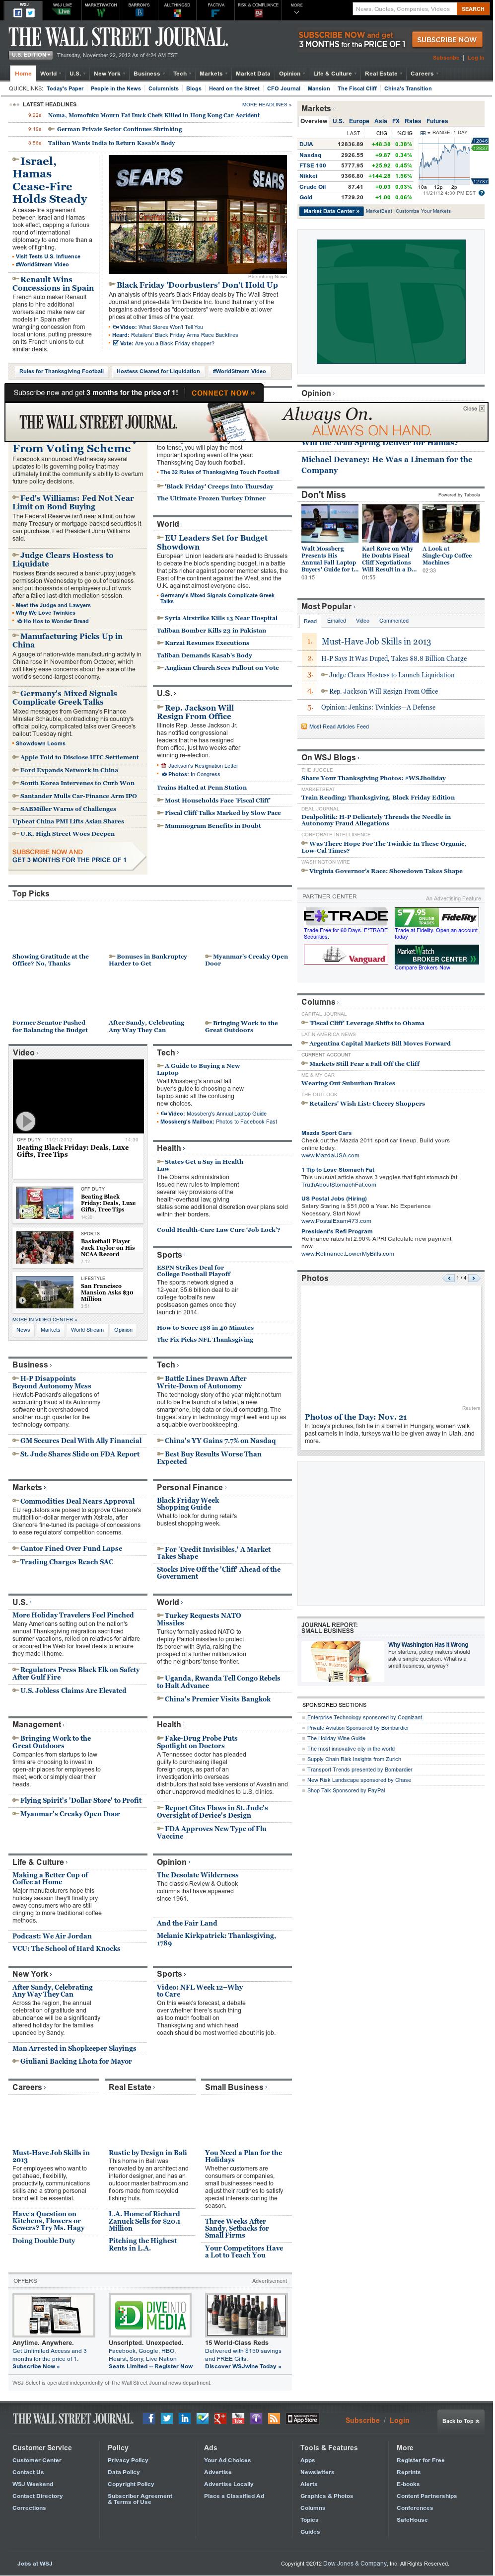 The Wall Street Journal at Thursday Nov. 22, 2012, 9:34 a.m. UTC